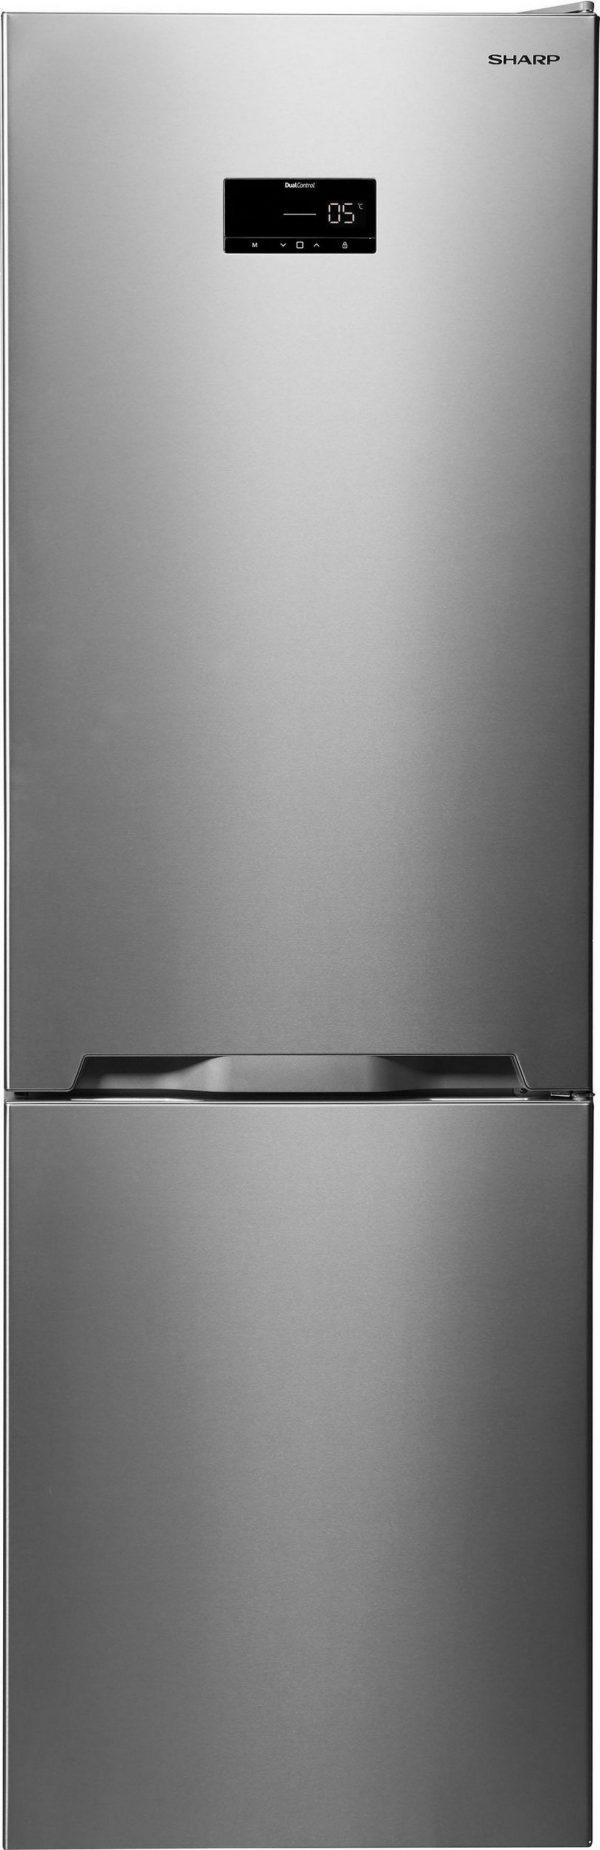 Хладилник с фризер Sharp SJ-BA10IHXI3-EU